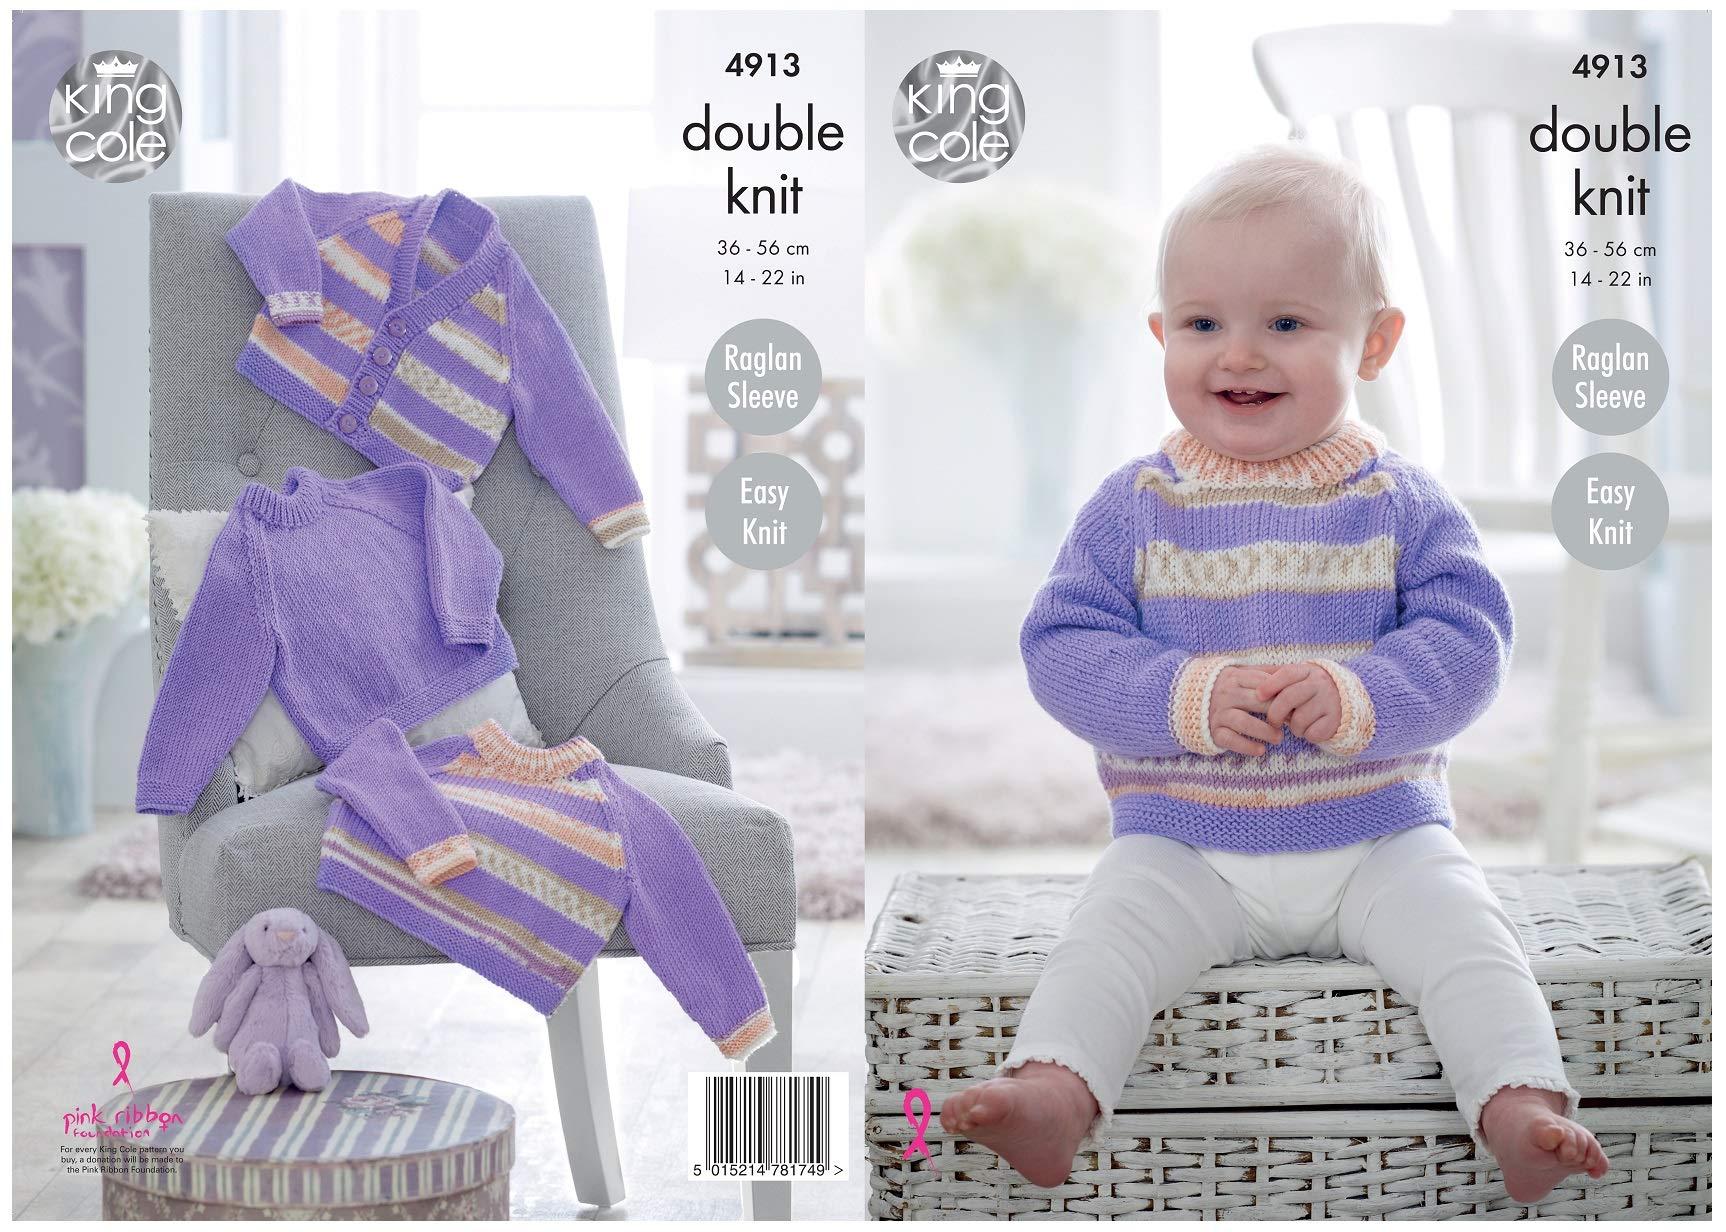 King Cole Baby Knitting Pattern Easy Knit Raglan Jacket Jumper Cardigan Hat 4805